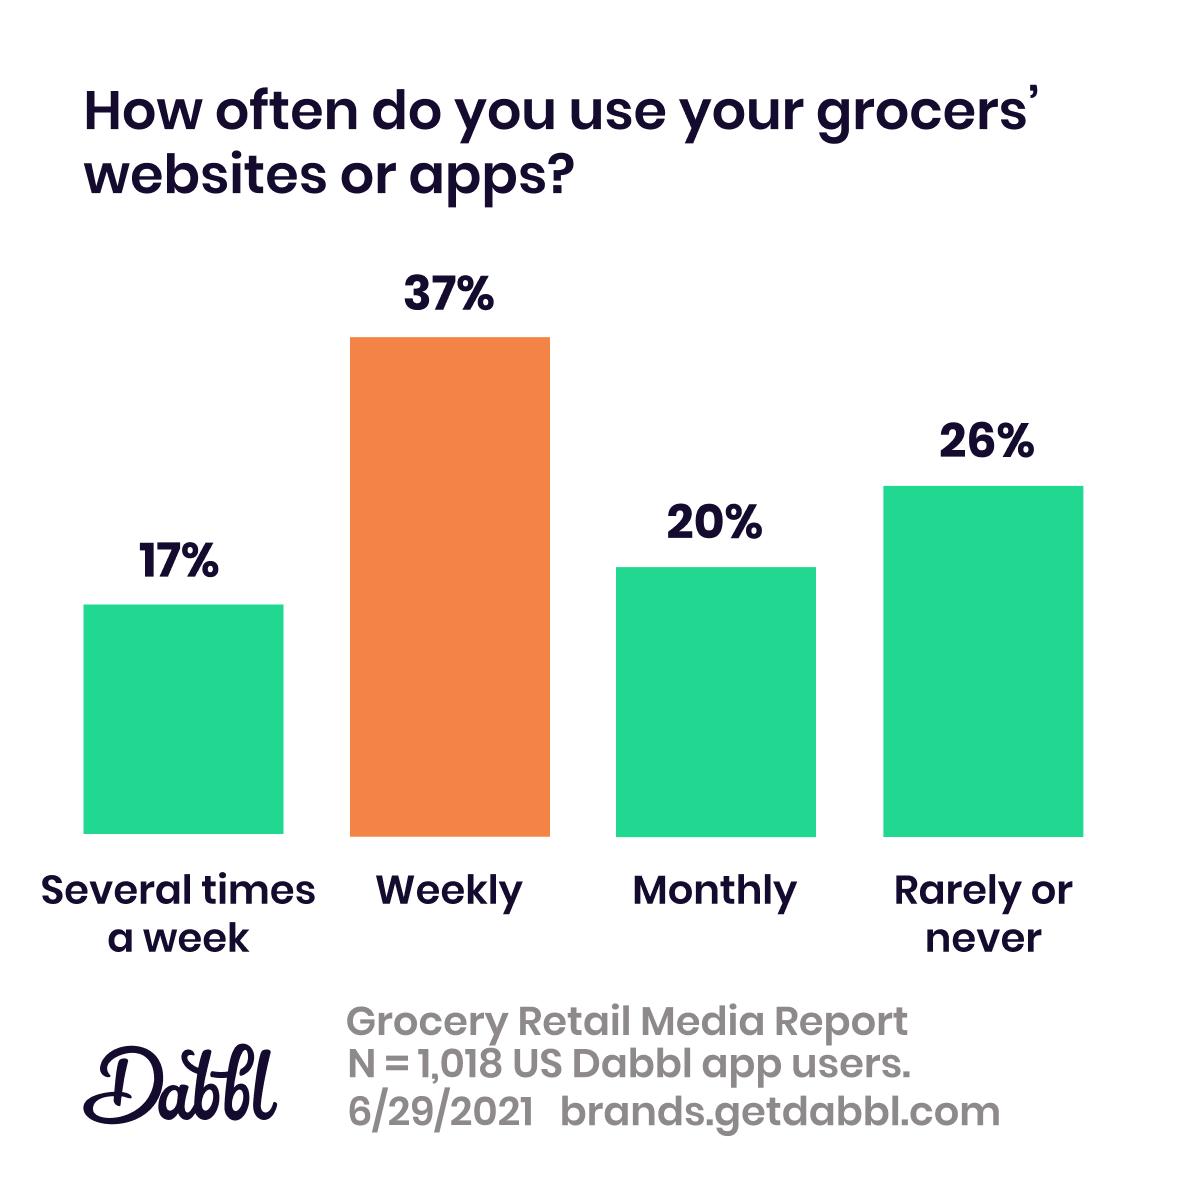 Dabbl Grocery Retail Media Report: digital properties usage